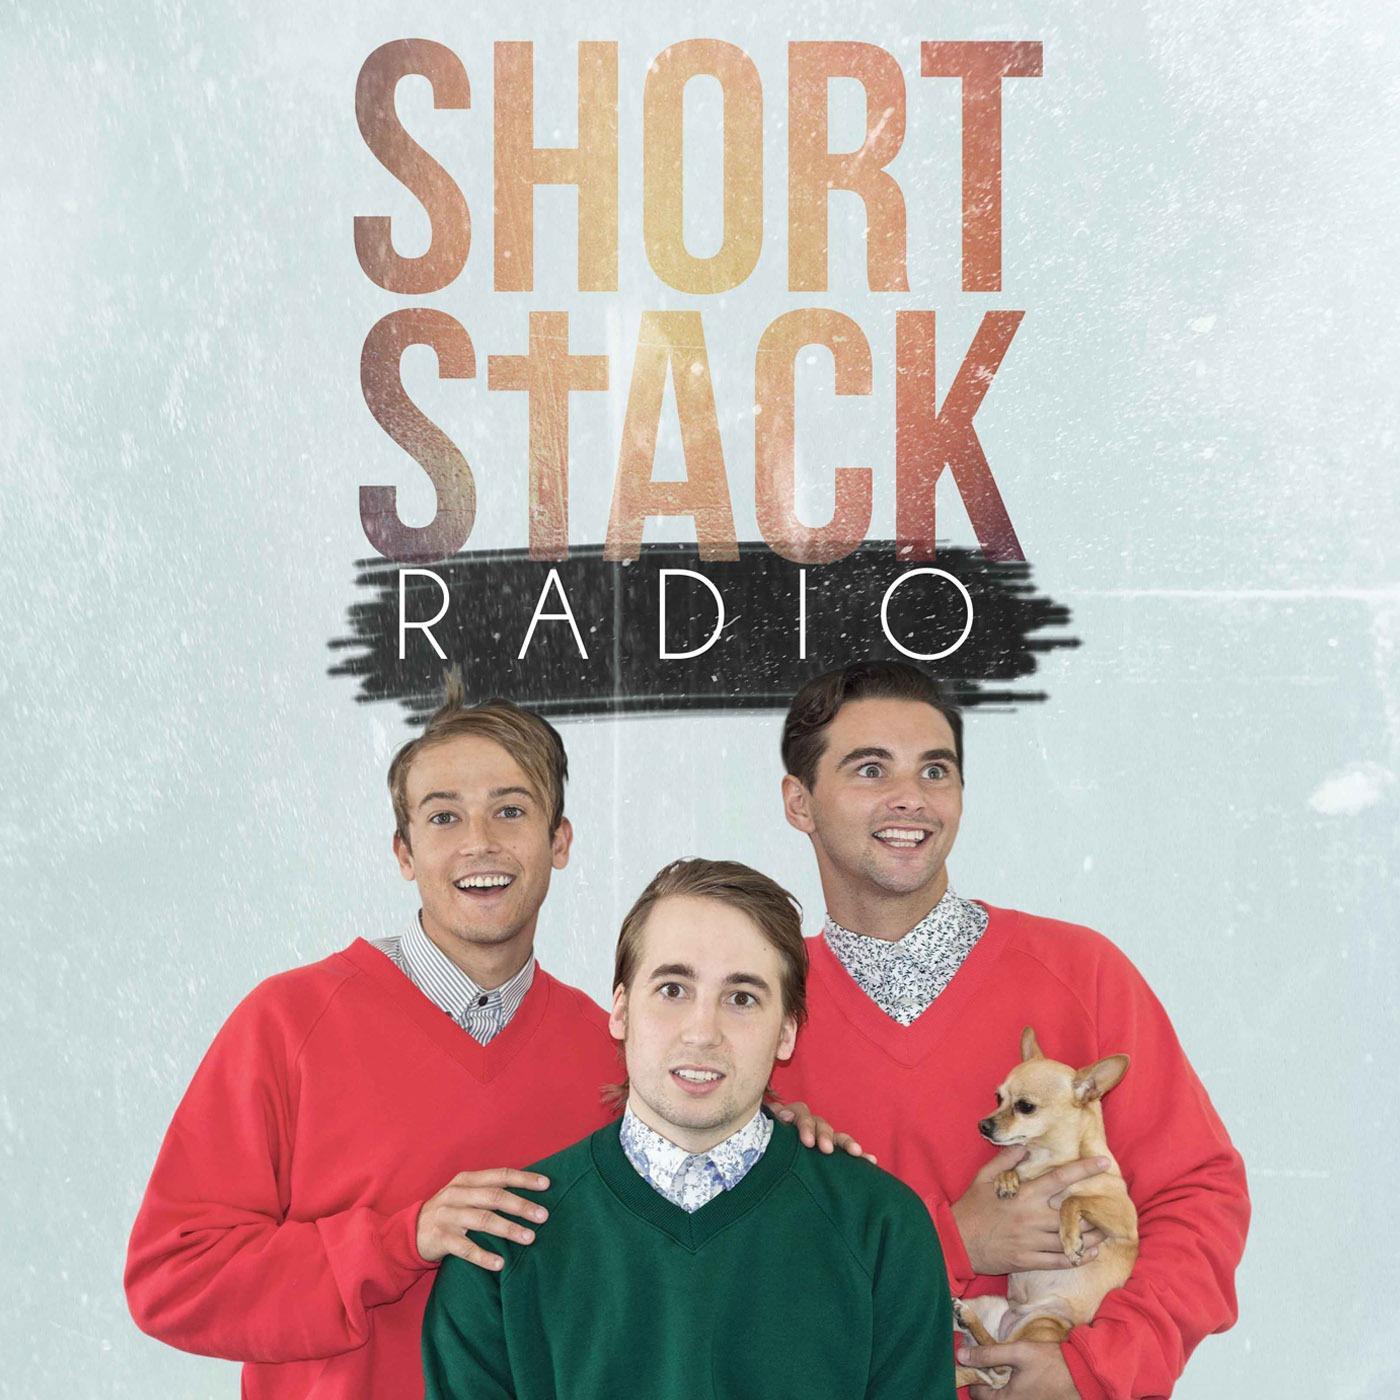 Short Stack Radio